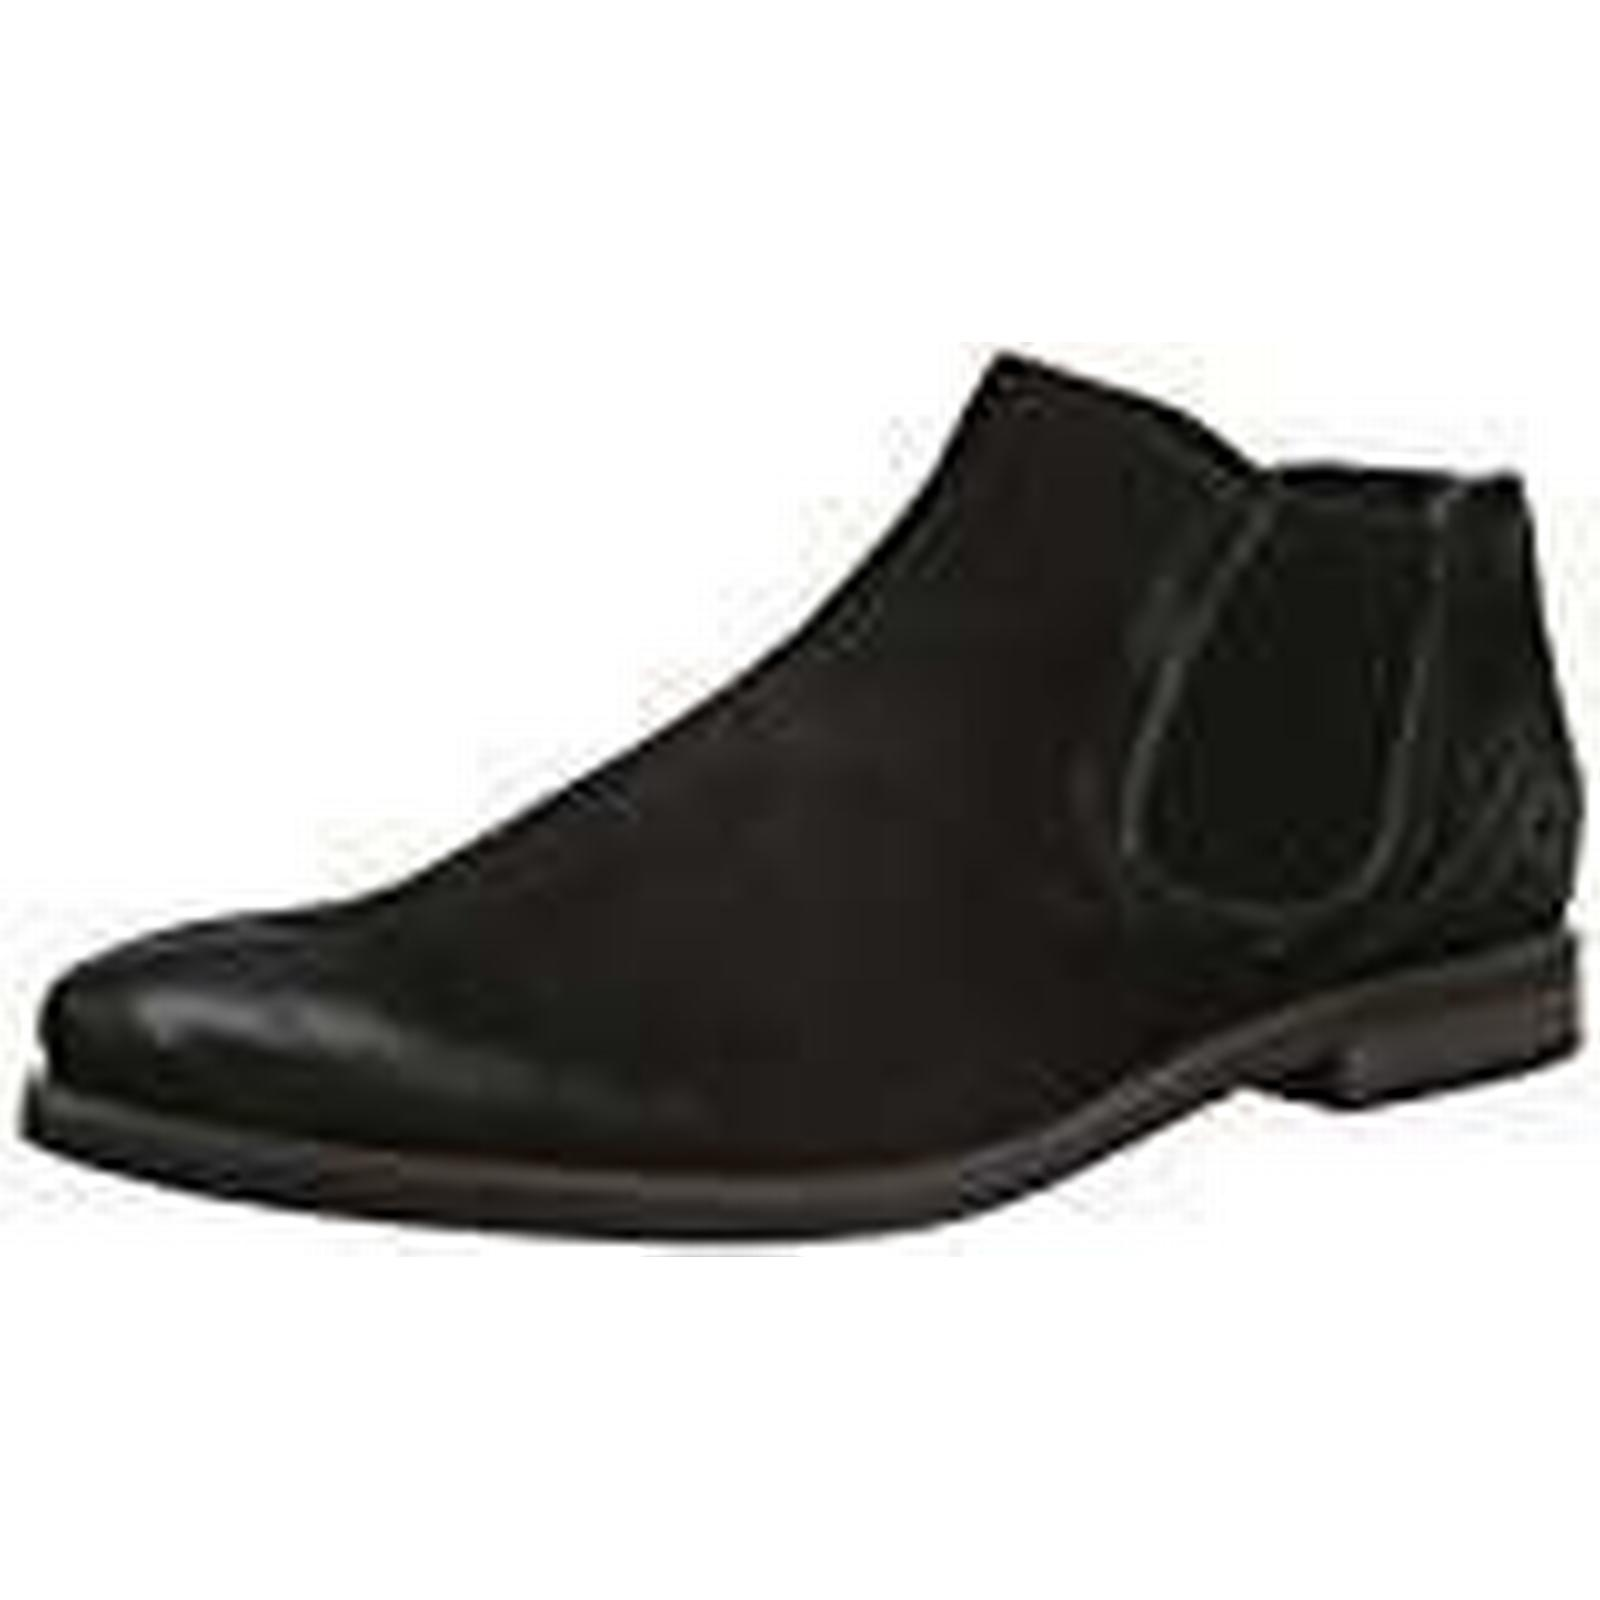 Bugatti Mens Black 312173203500 Chelsea Boots Black Mens Size: 11 UK f73ed6